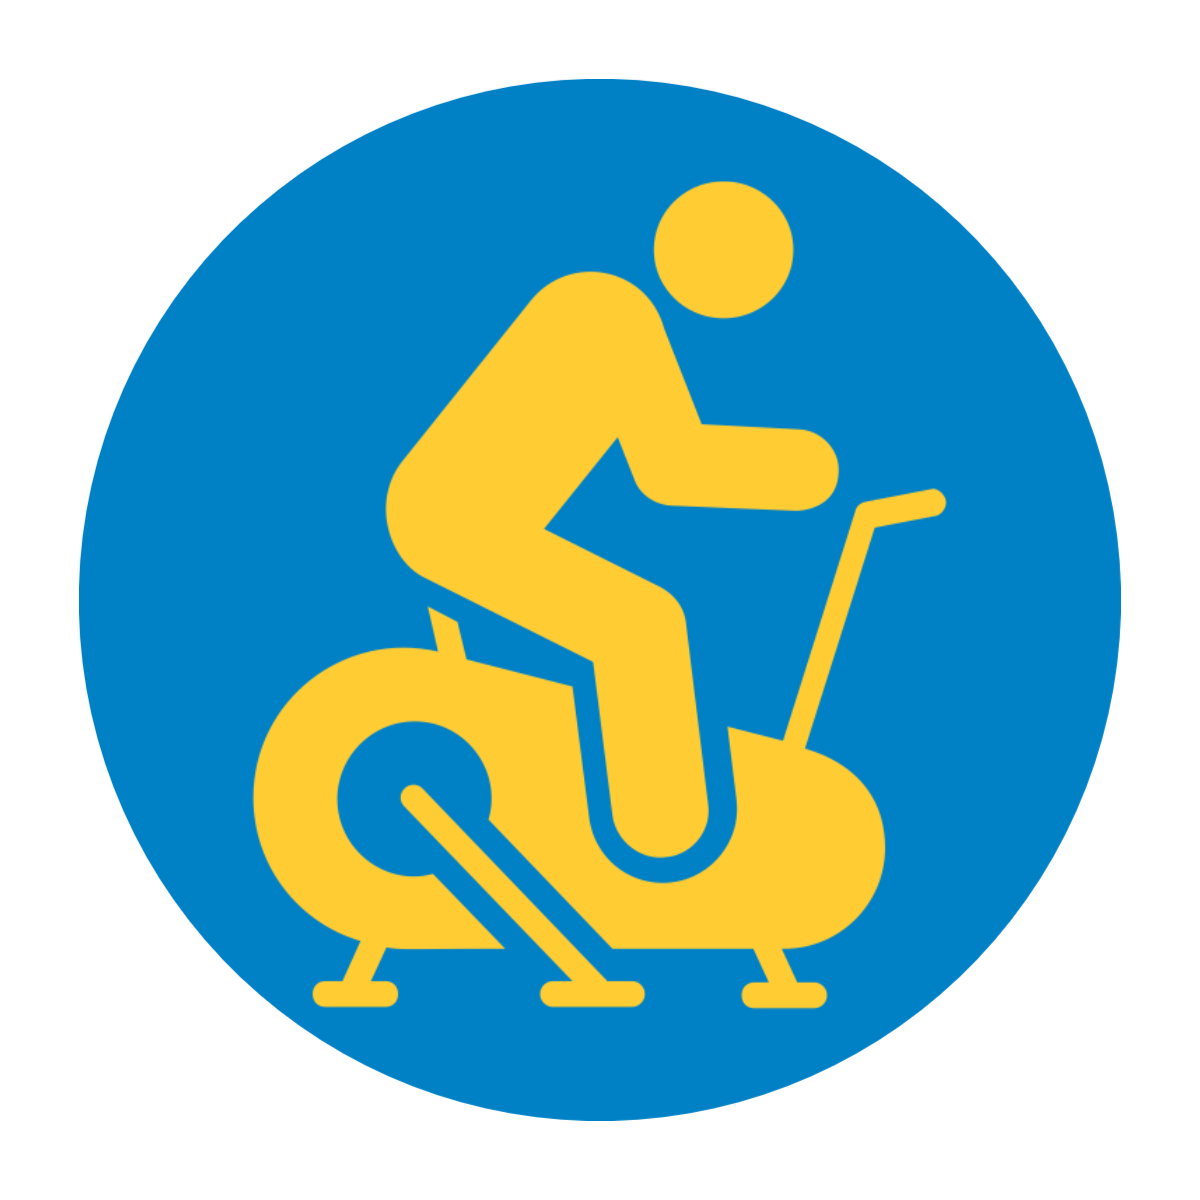 Sportoase Olympic Games